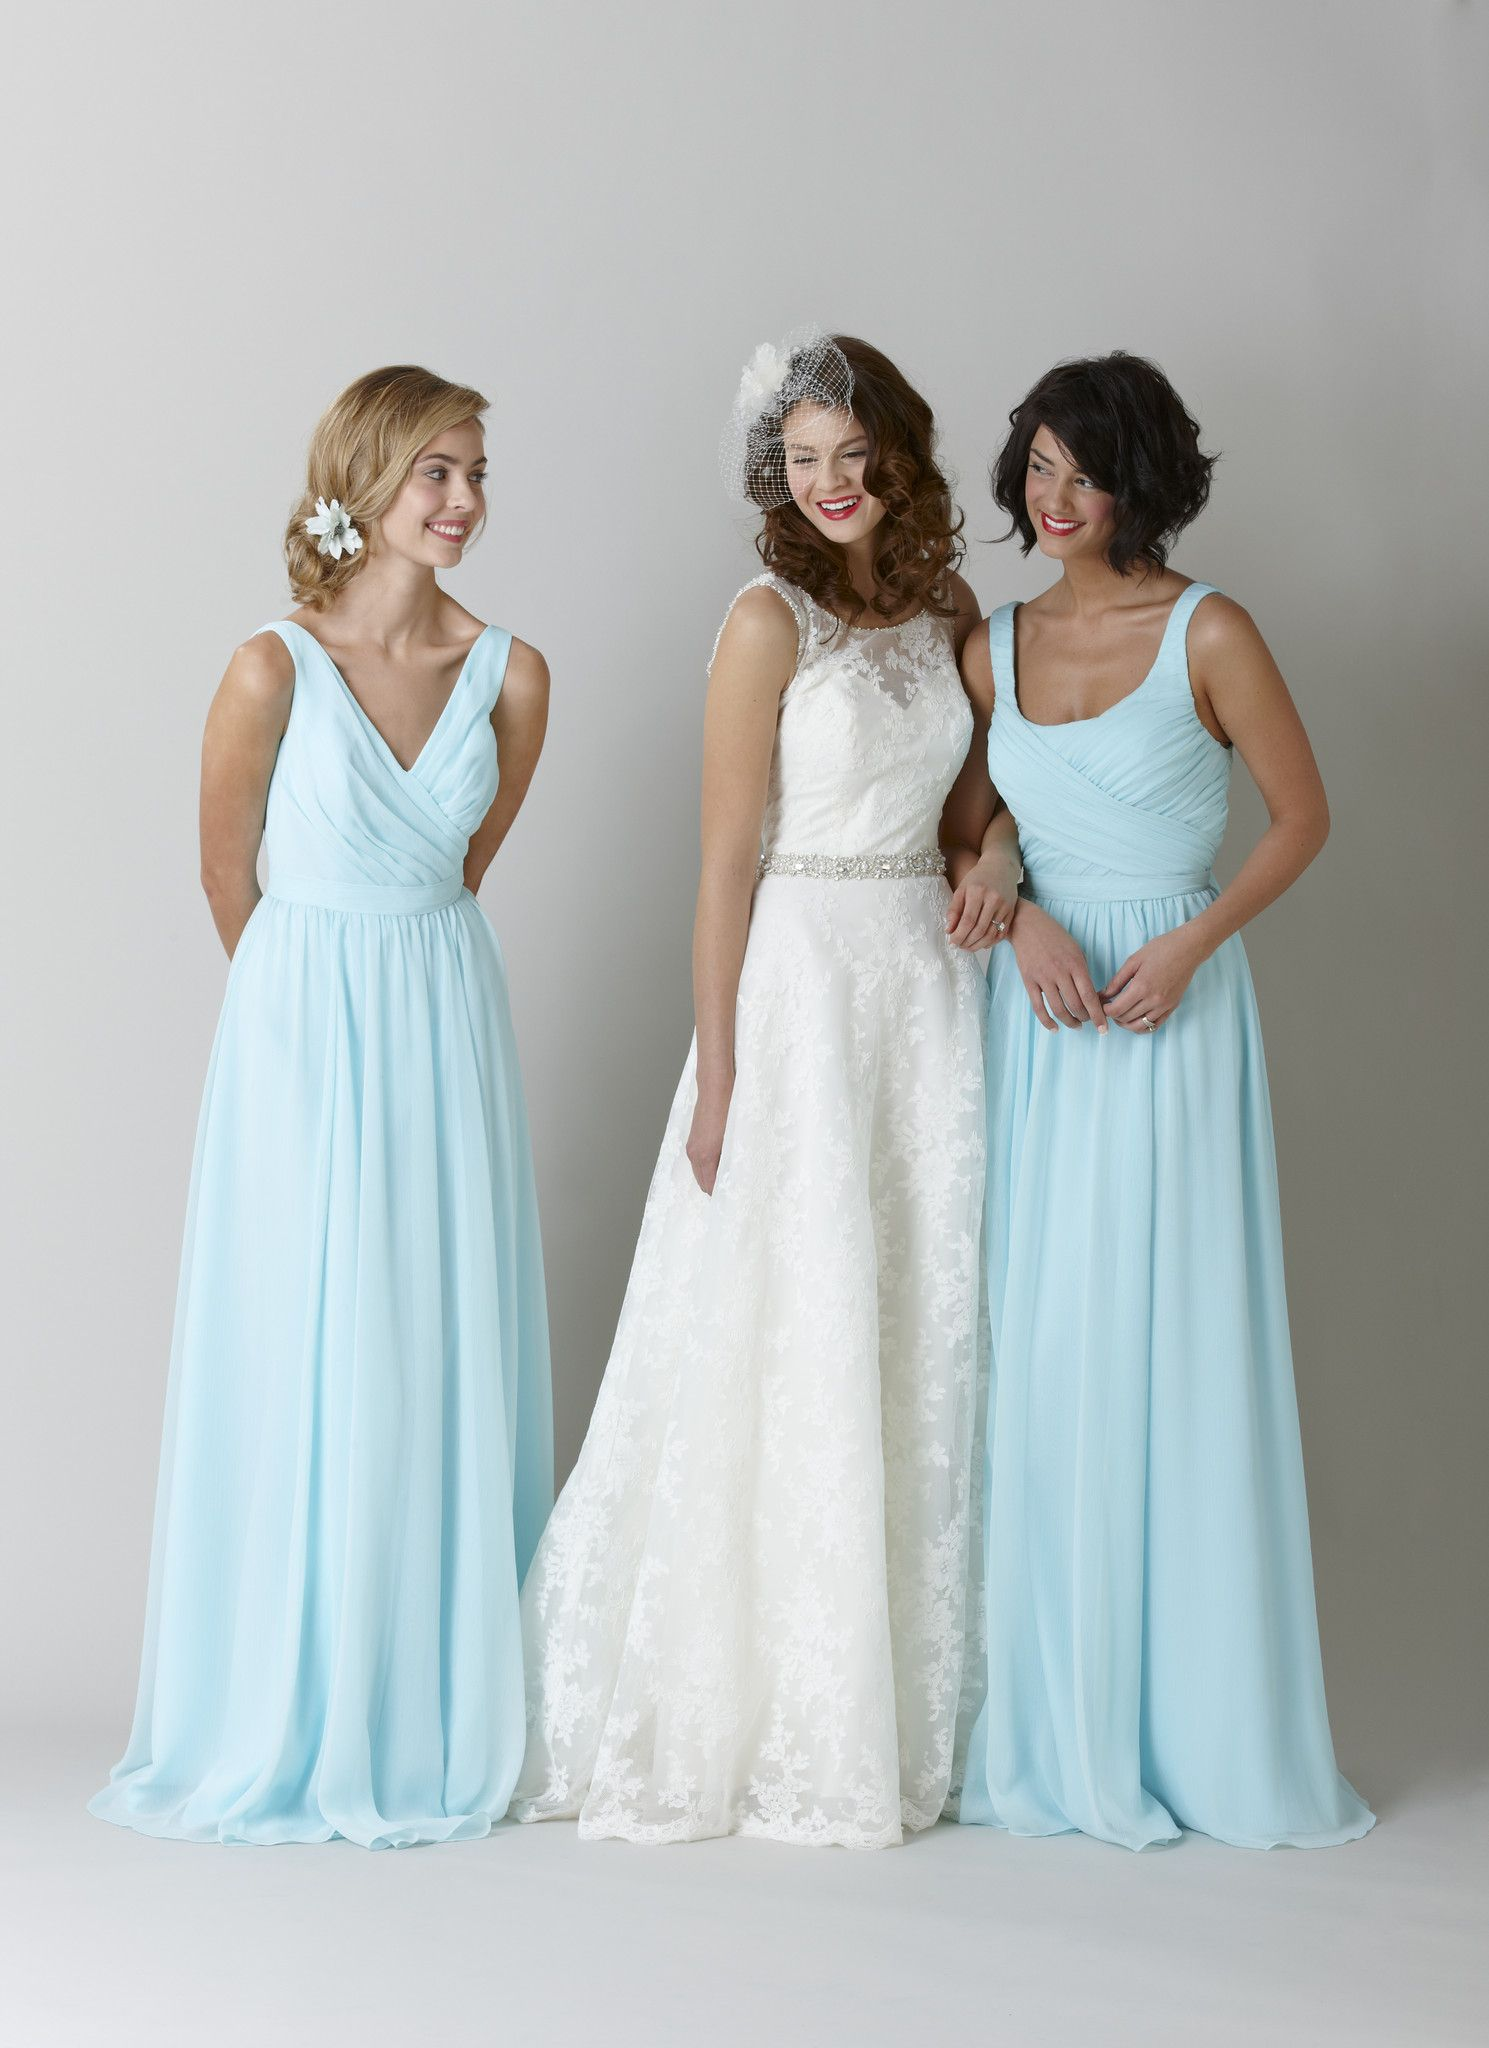 Nicole | Blue wedding dresses, Wedding dress and Weddings